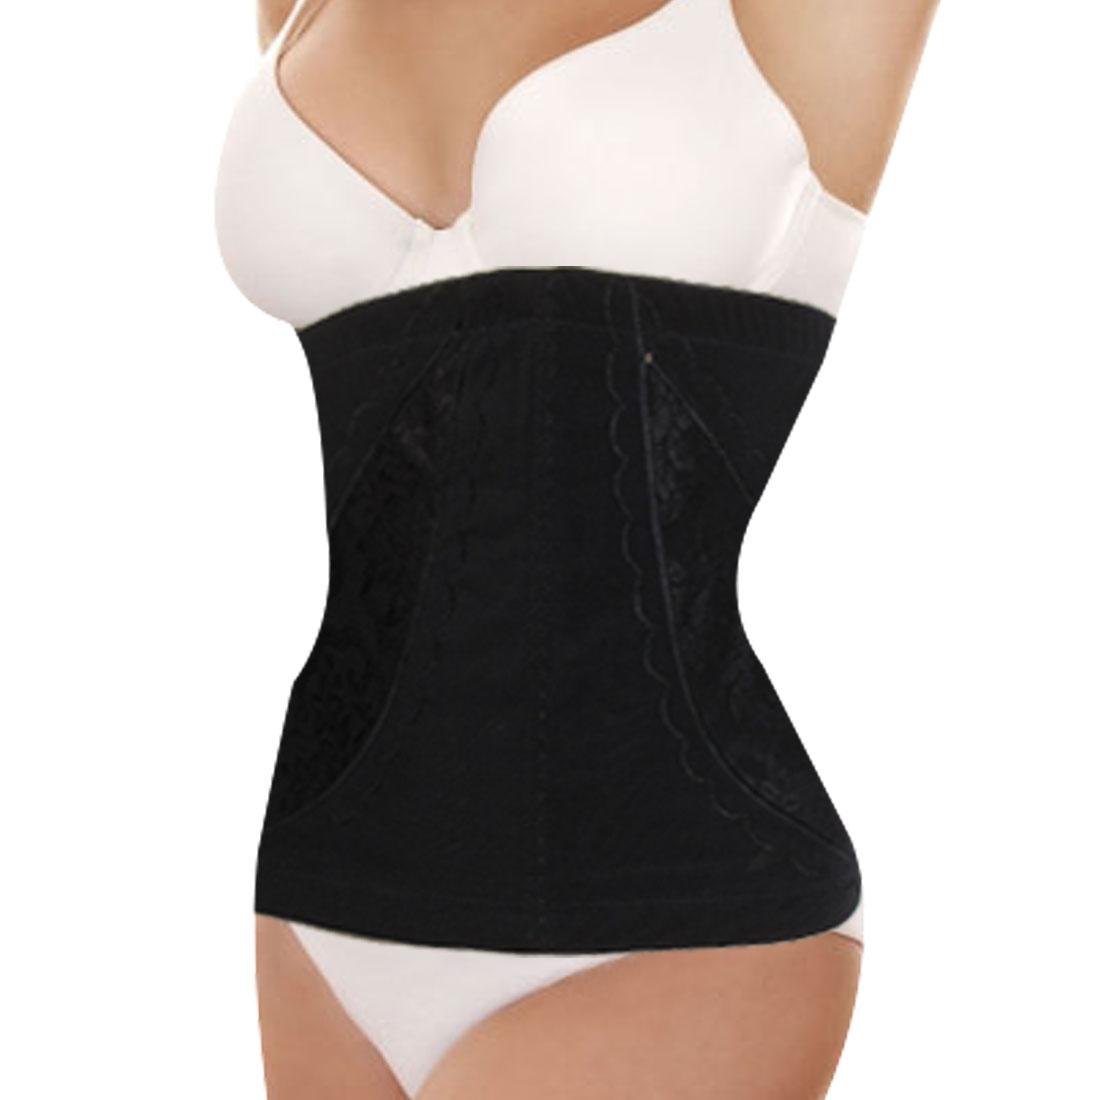 Women Black Flower Print Elastic Body Shaper Corset Girdle Waist Cincher L